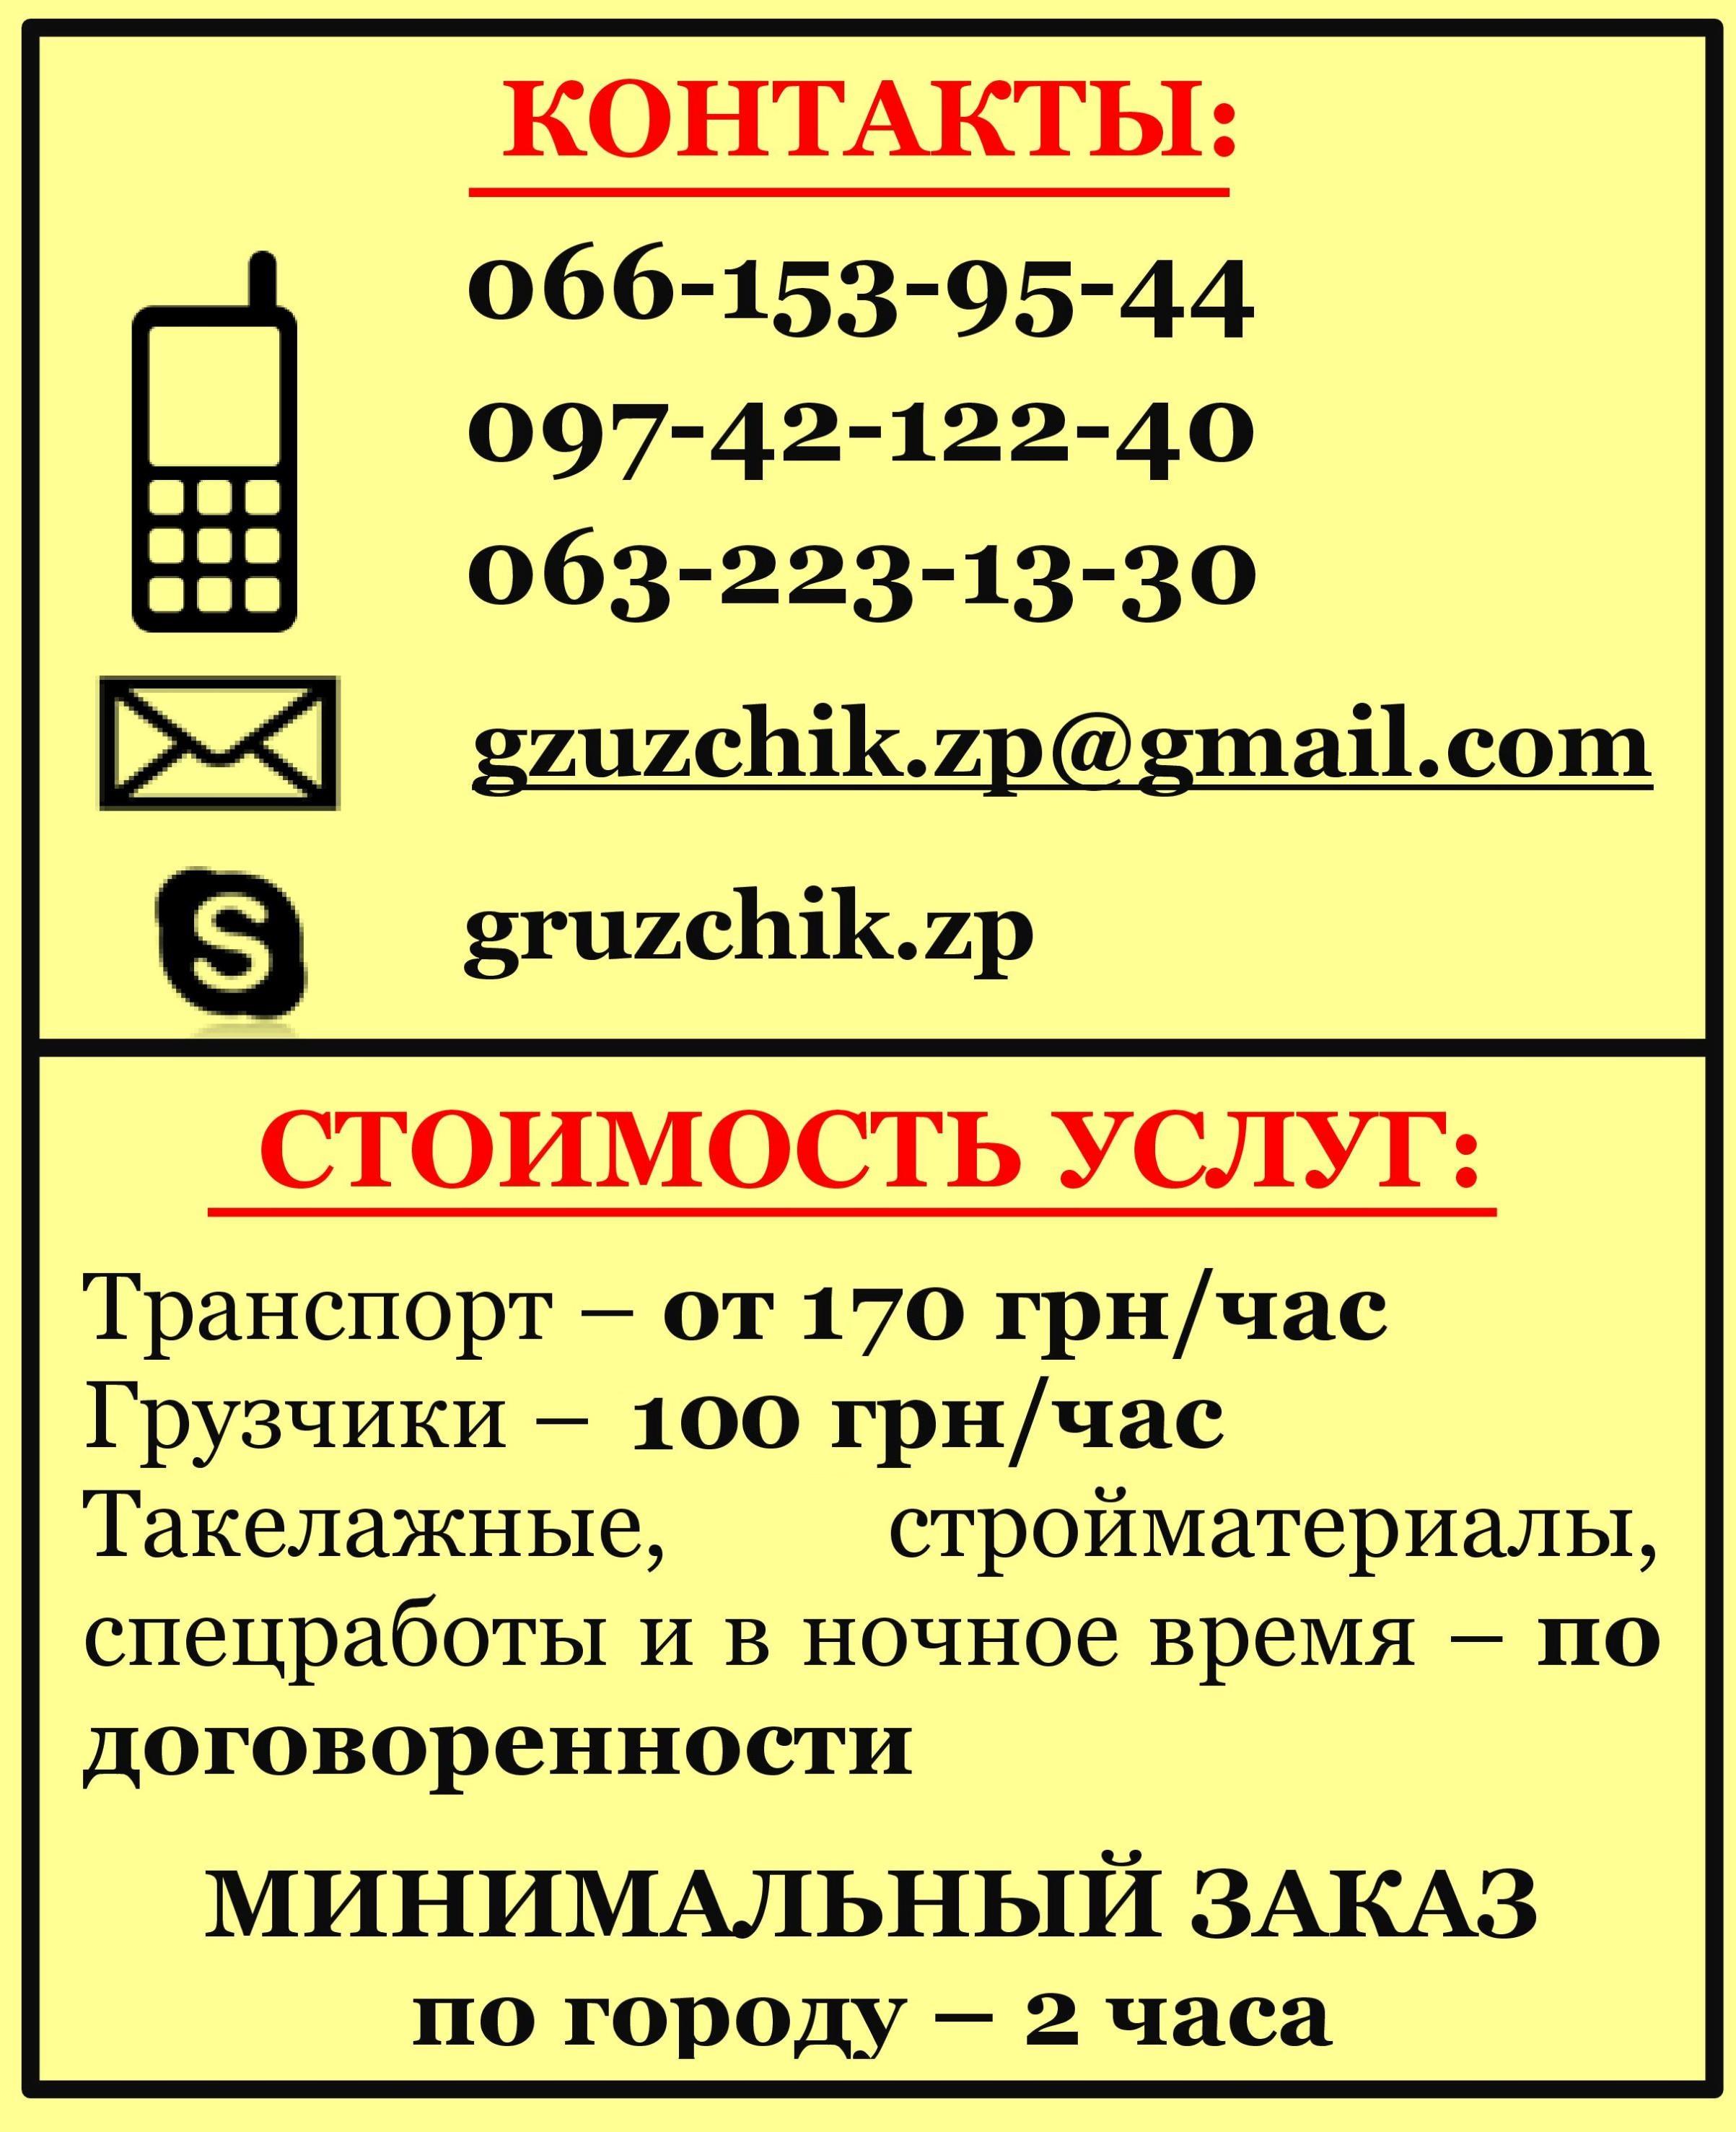 Контакты 066-153-95-44 097-42-122-40 e-mail: gzuzchik.zp@gmail.com skype: gruzchik.zp